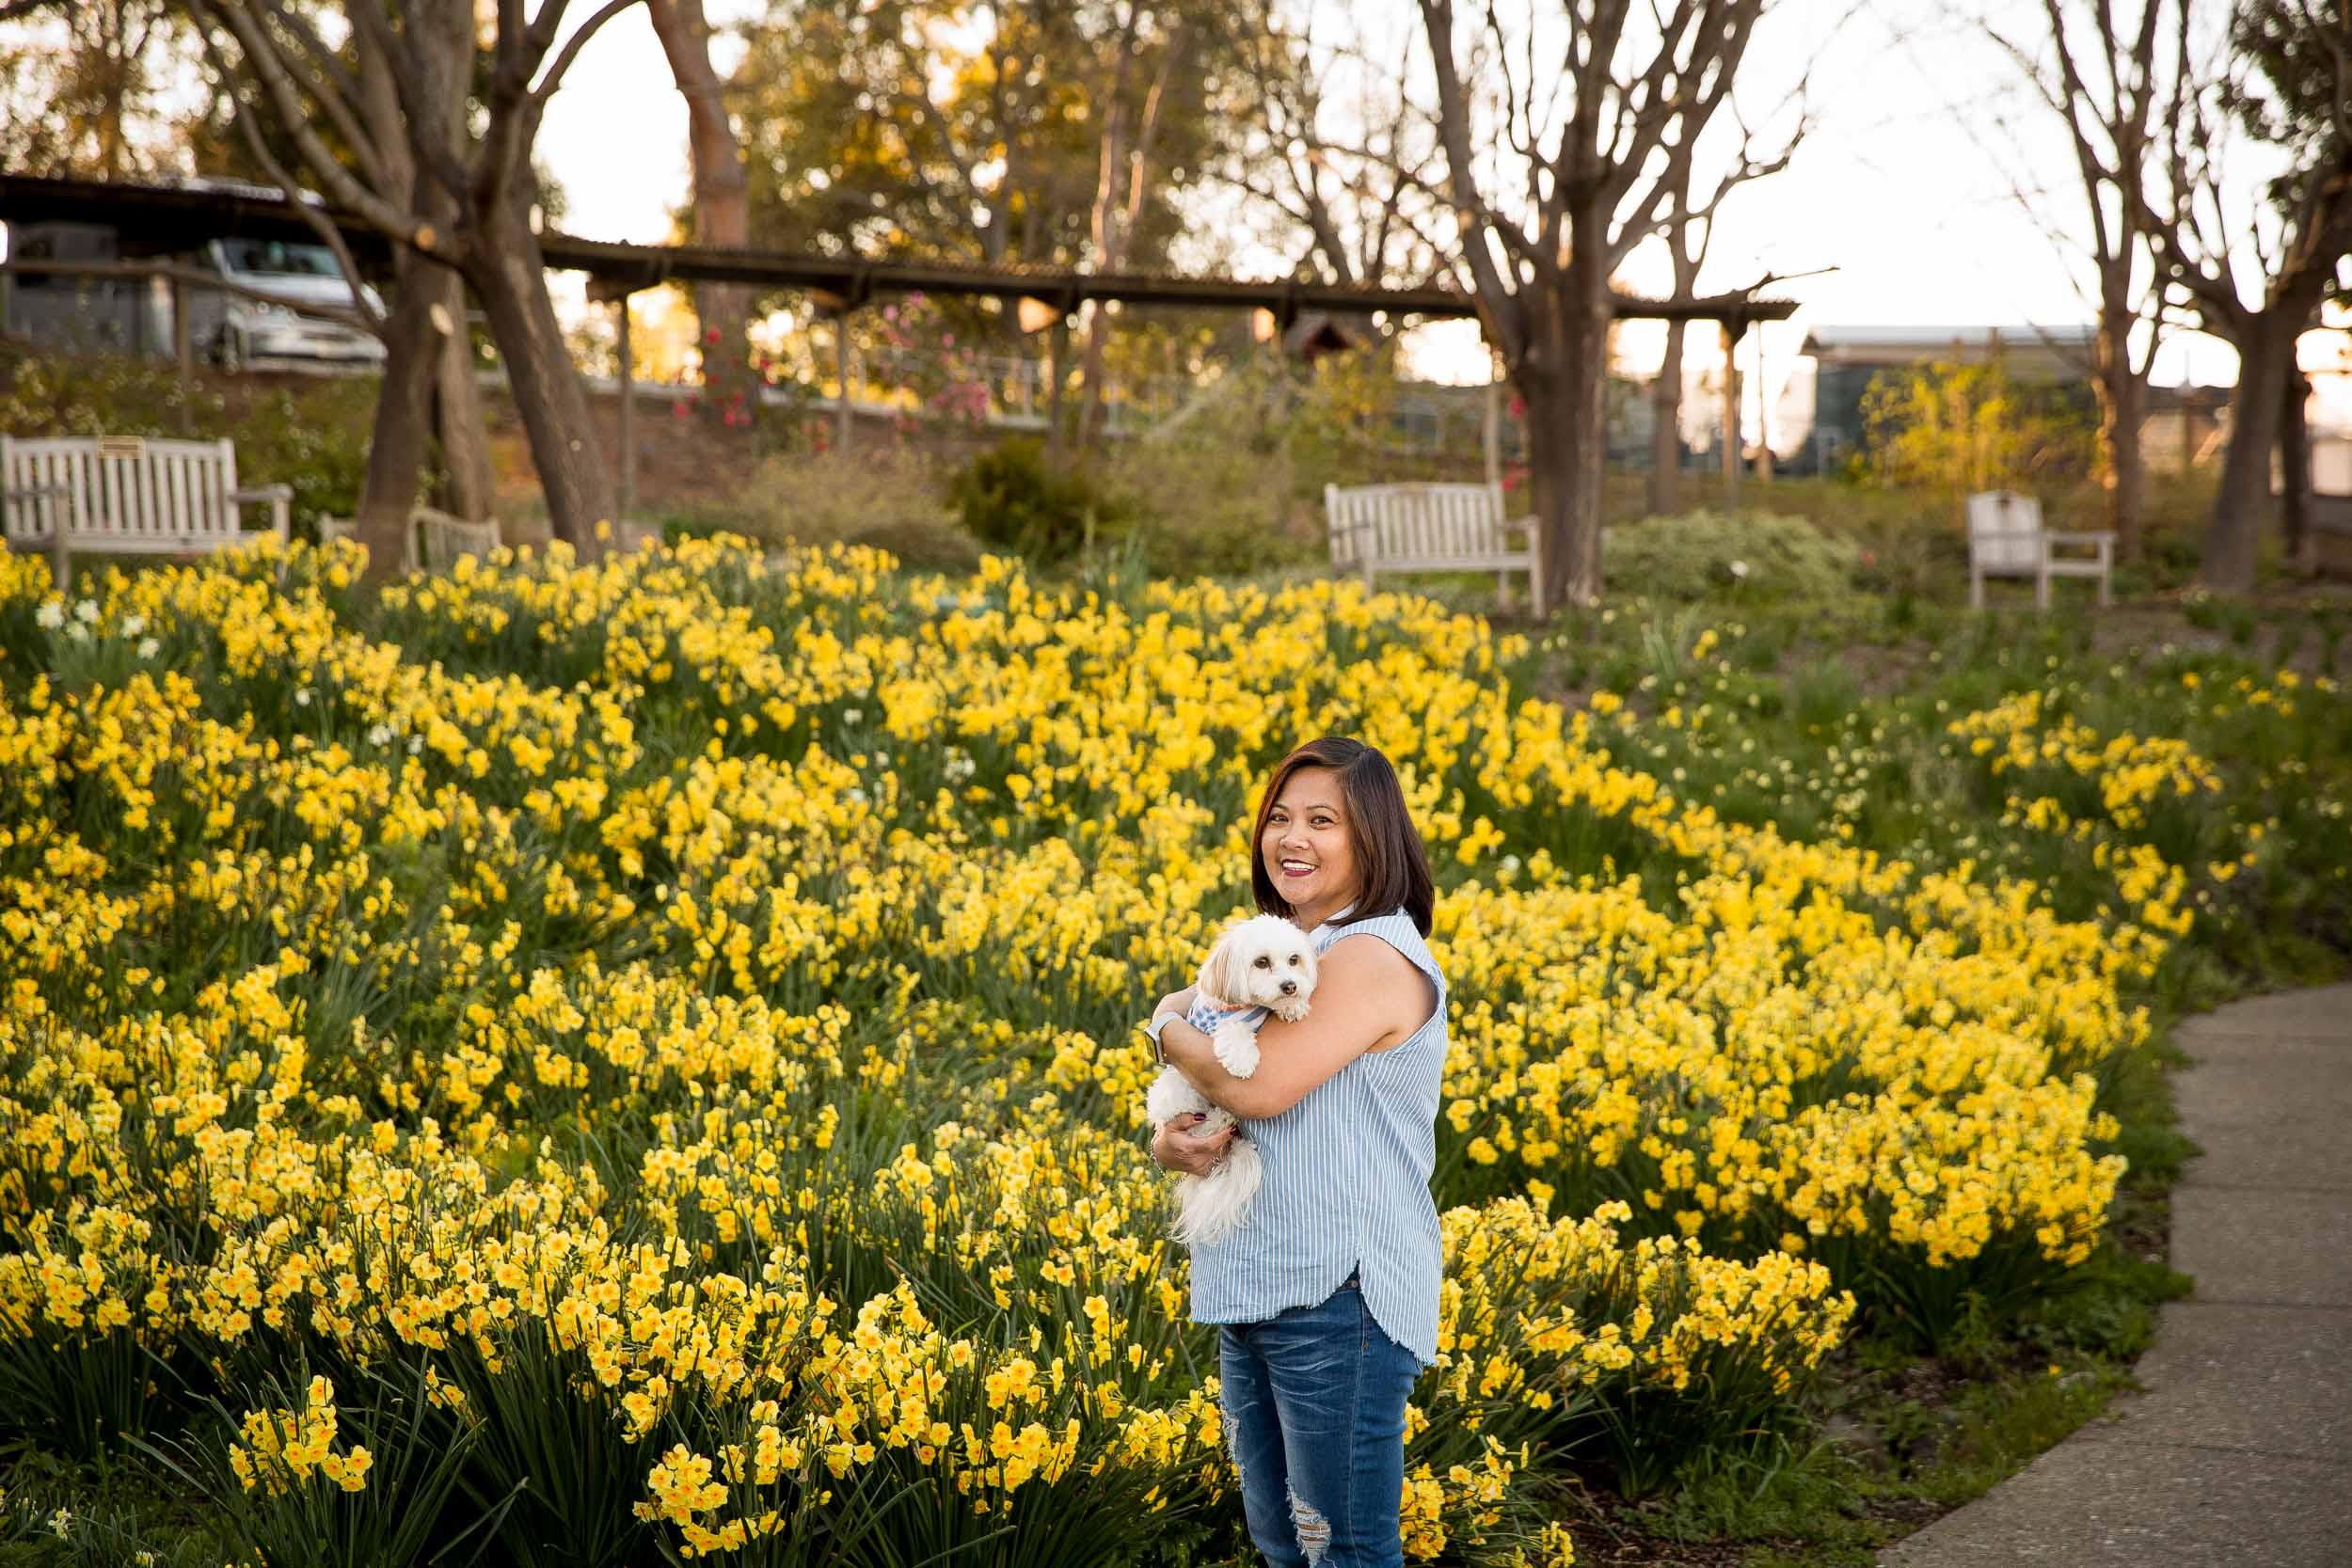 Heather-Farm-Walnut-Creek-family-photos-12.jpg